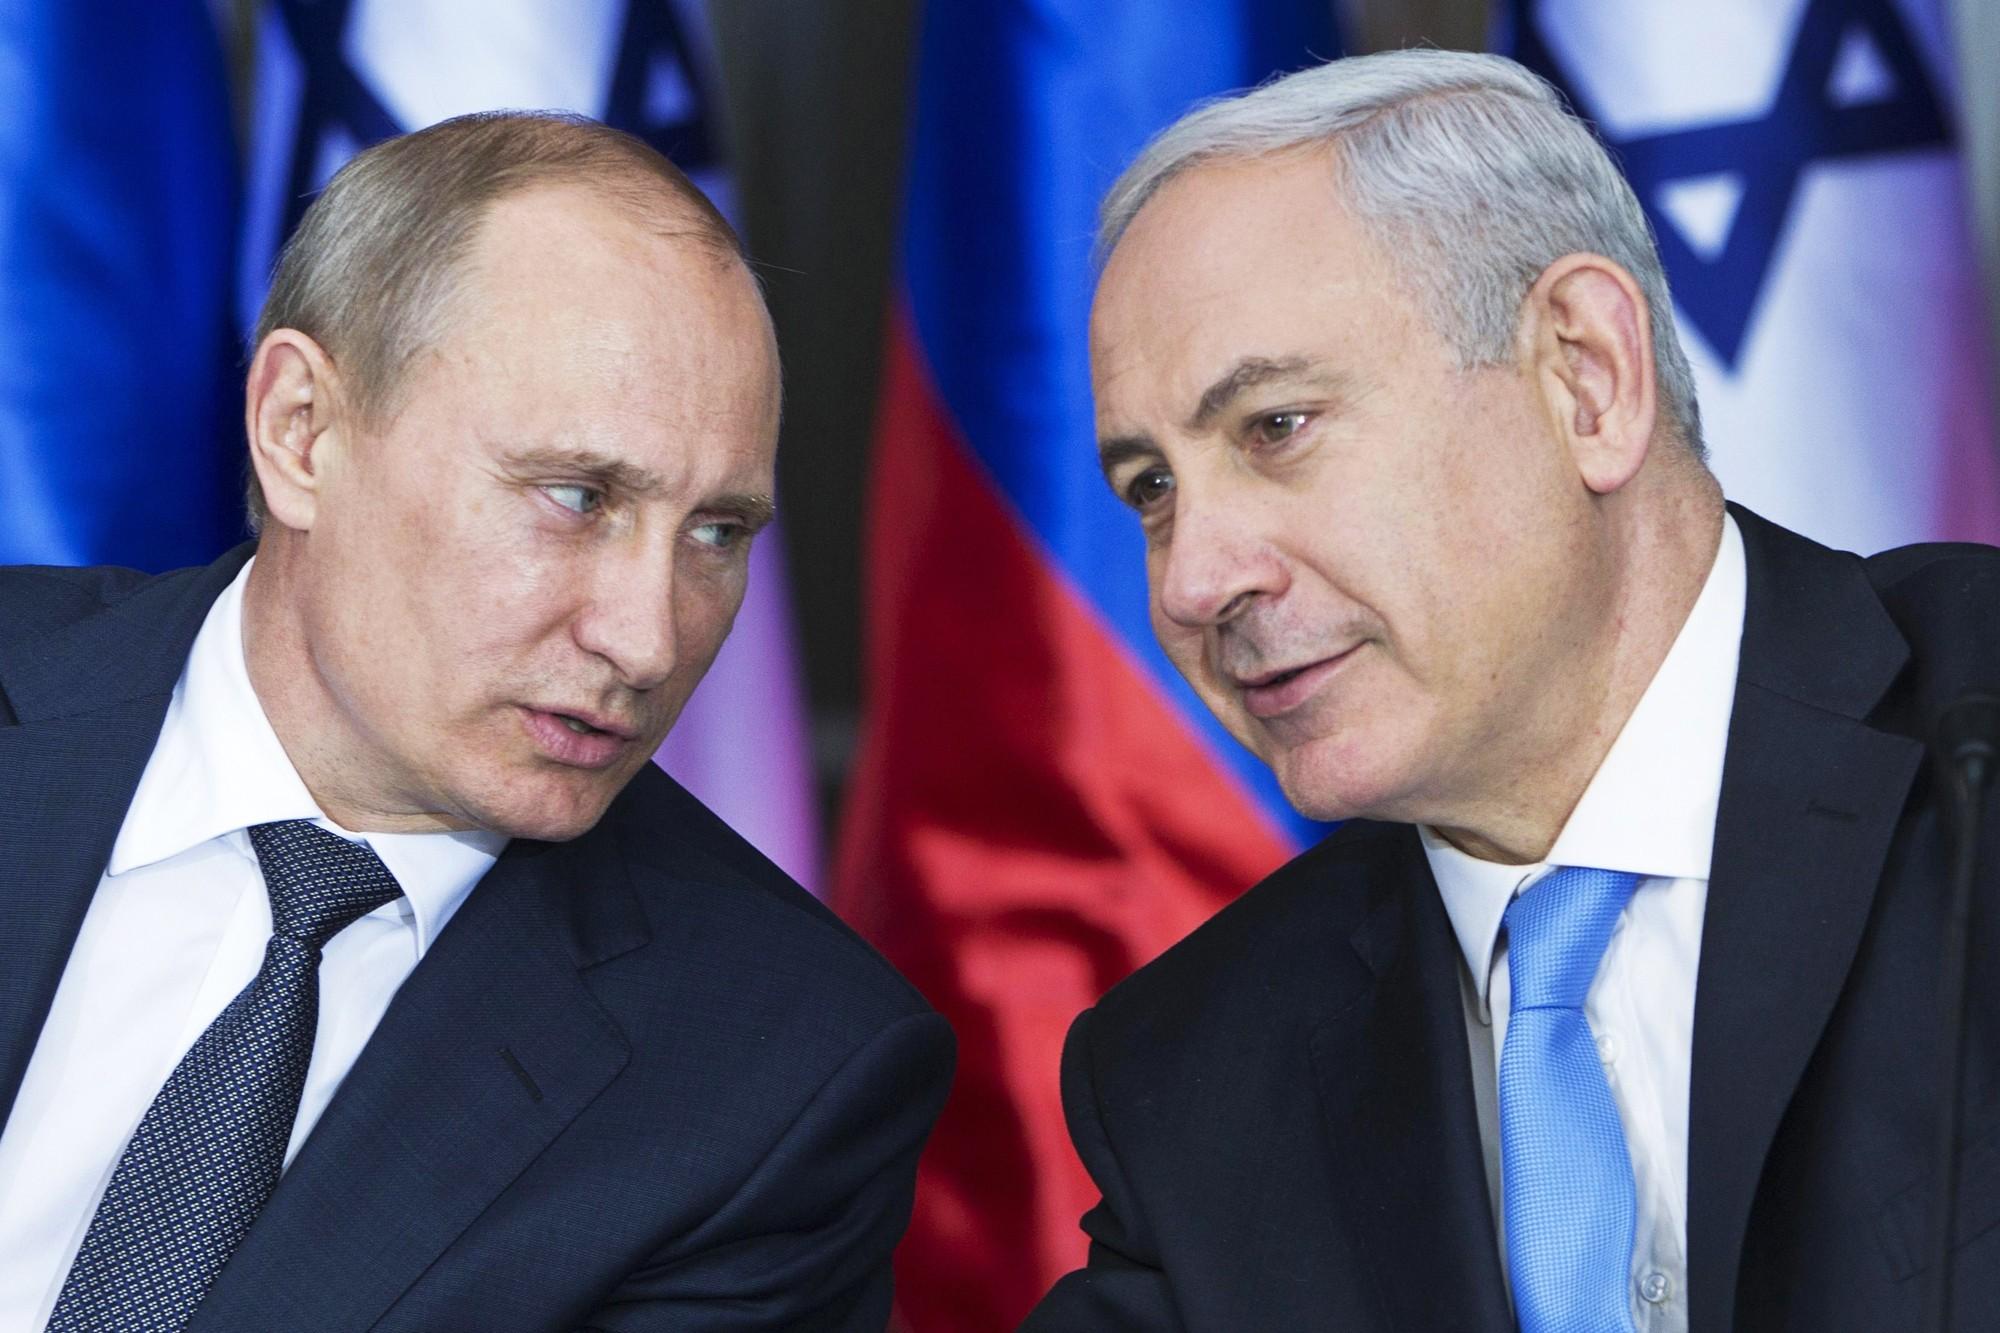 Russian President Vladimir Putin and Israeli Prime Minister Benjamin Netanyahu.